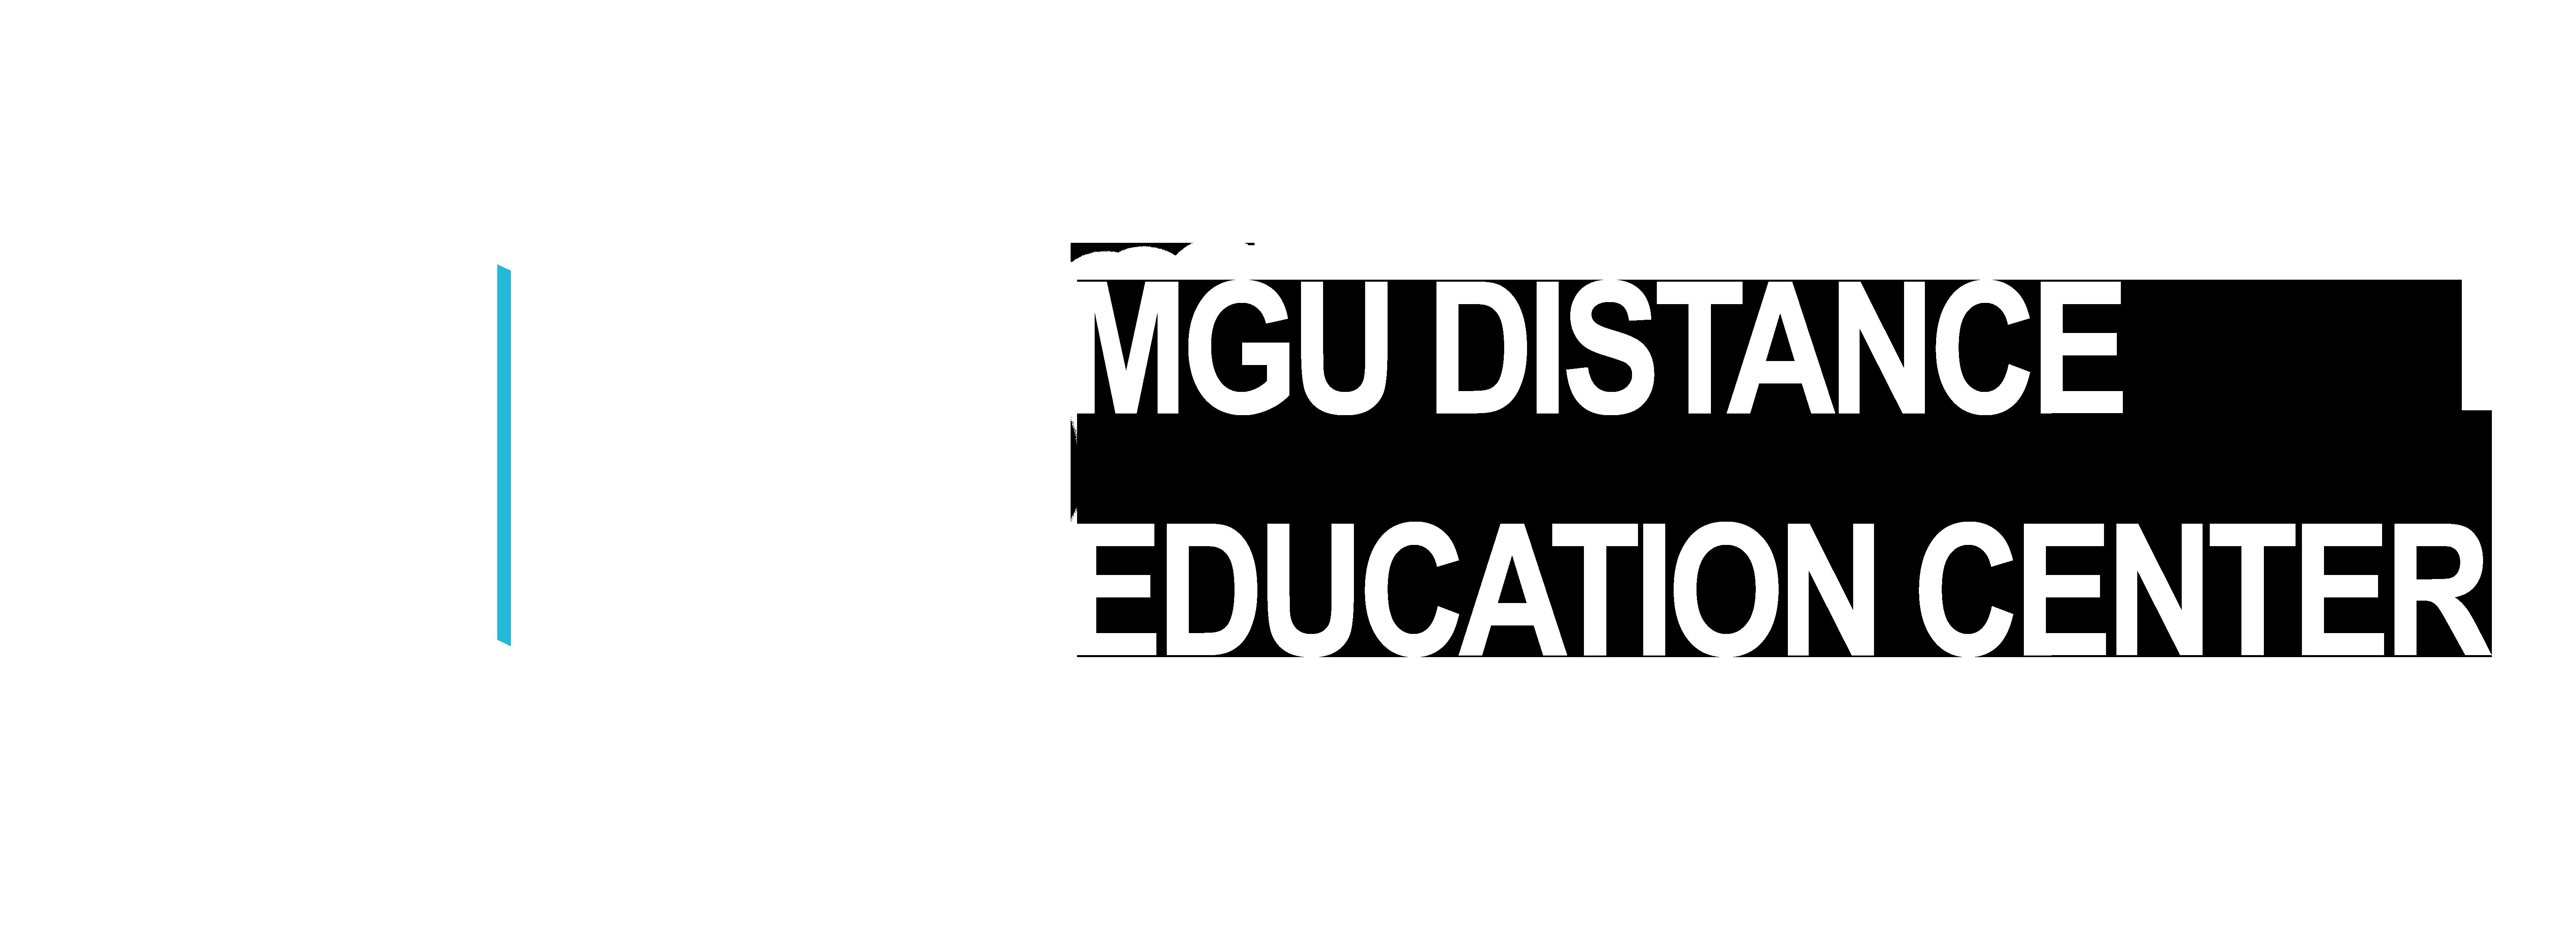 MGU Distance Education Center